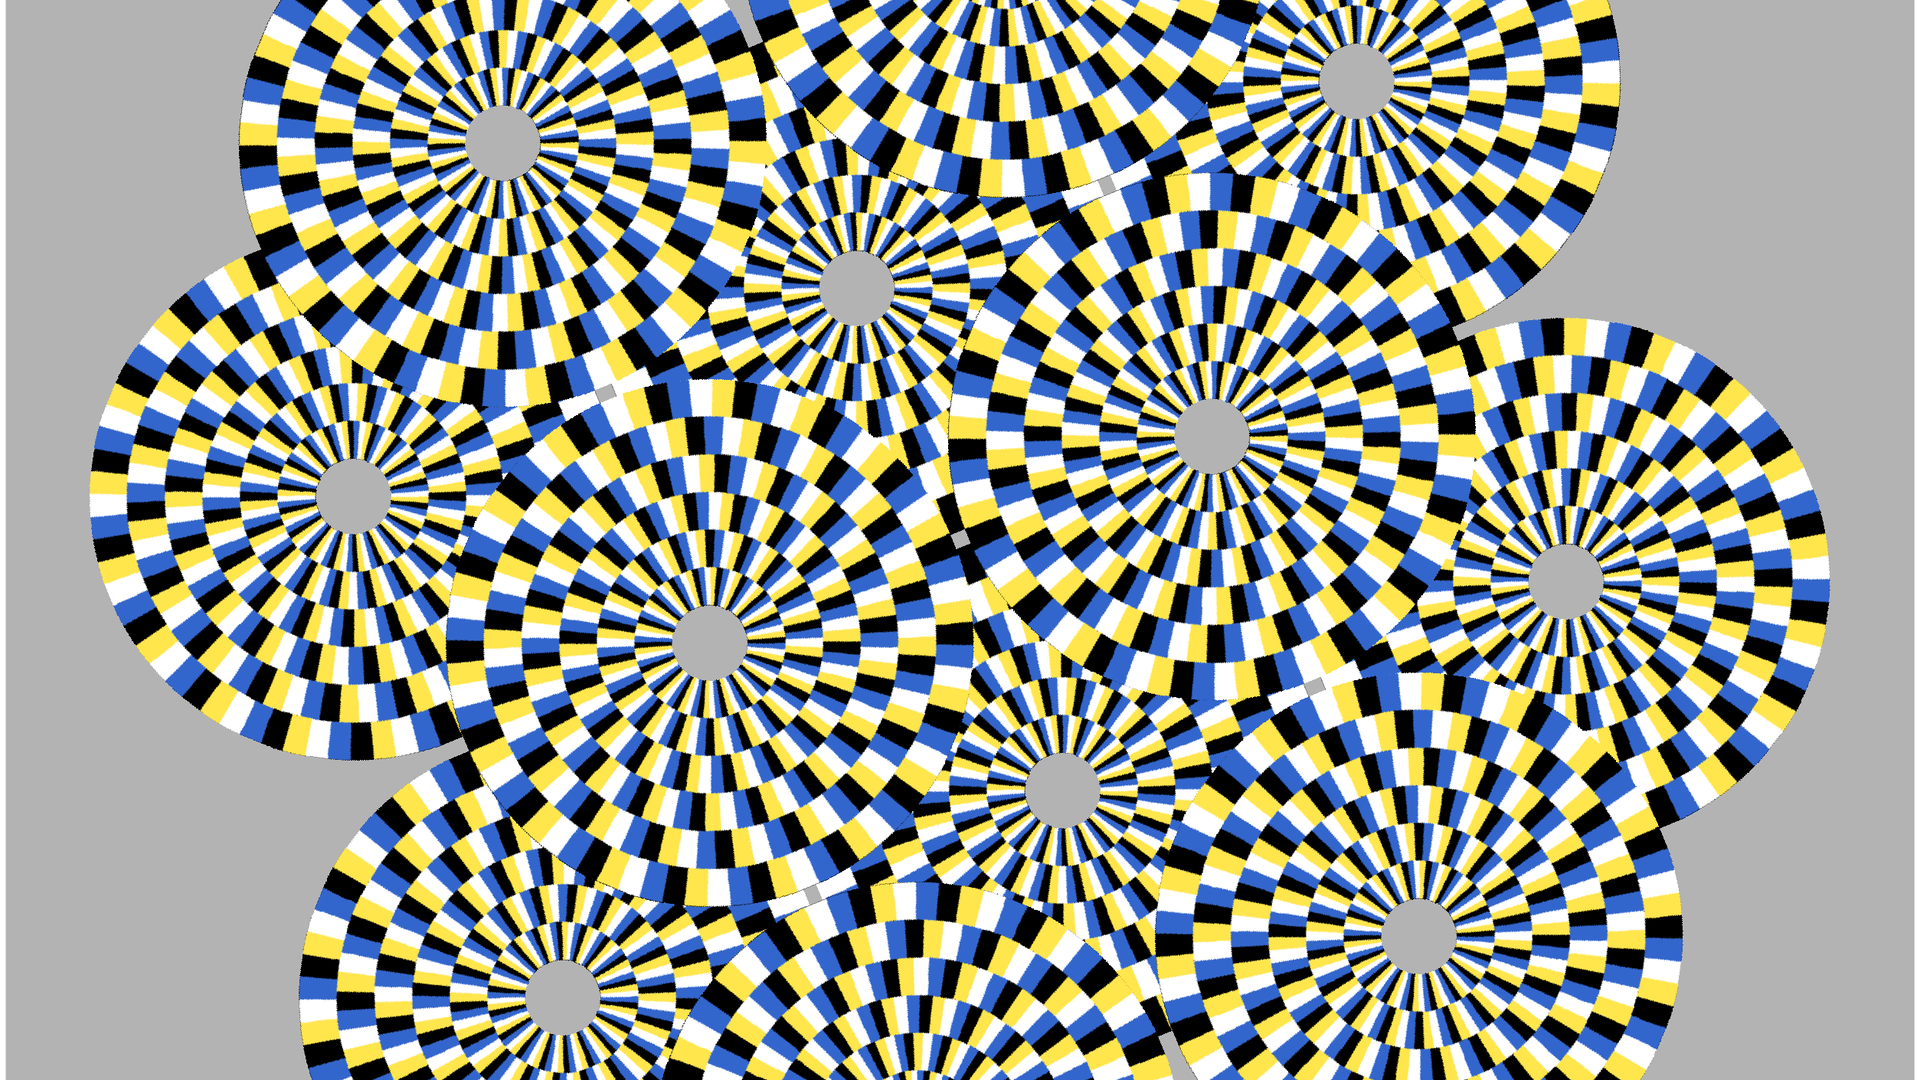 Rotating Snakes Illusion